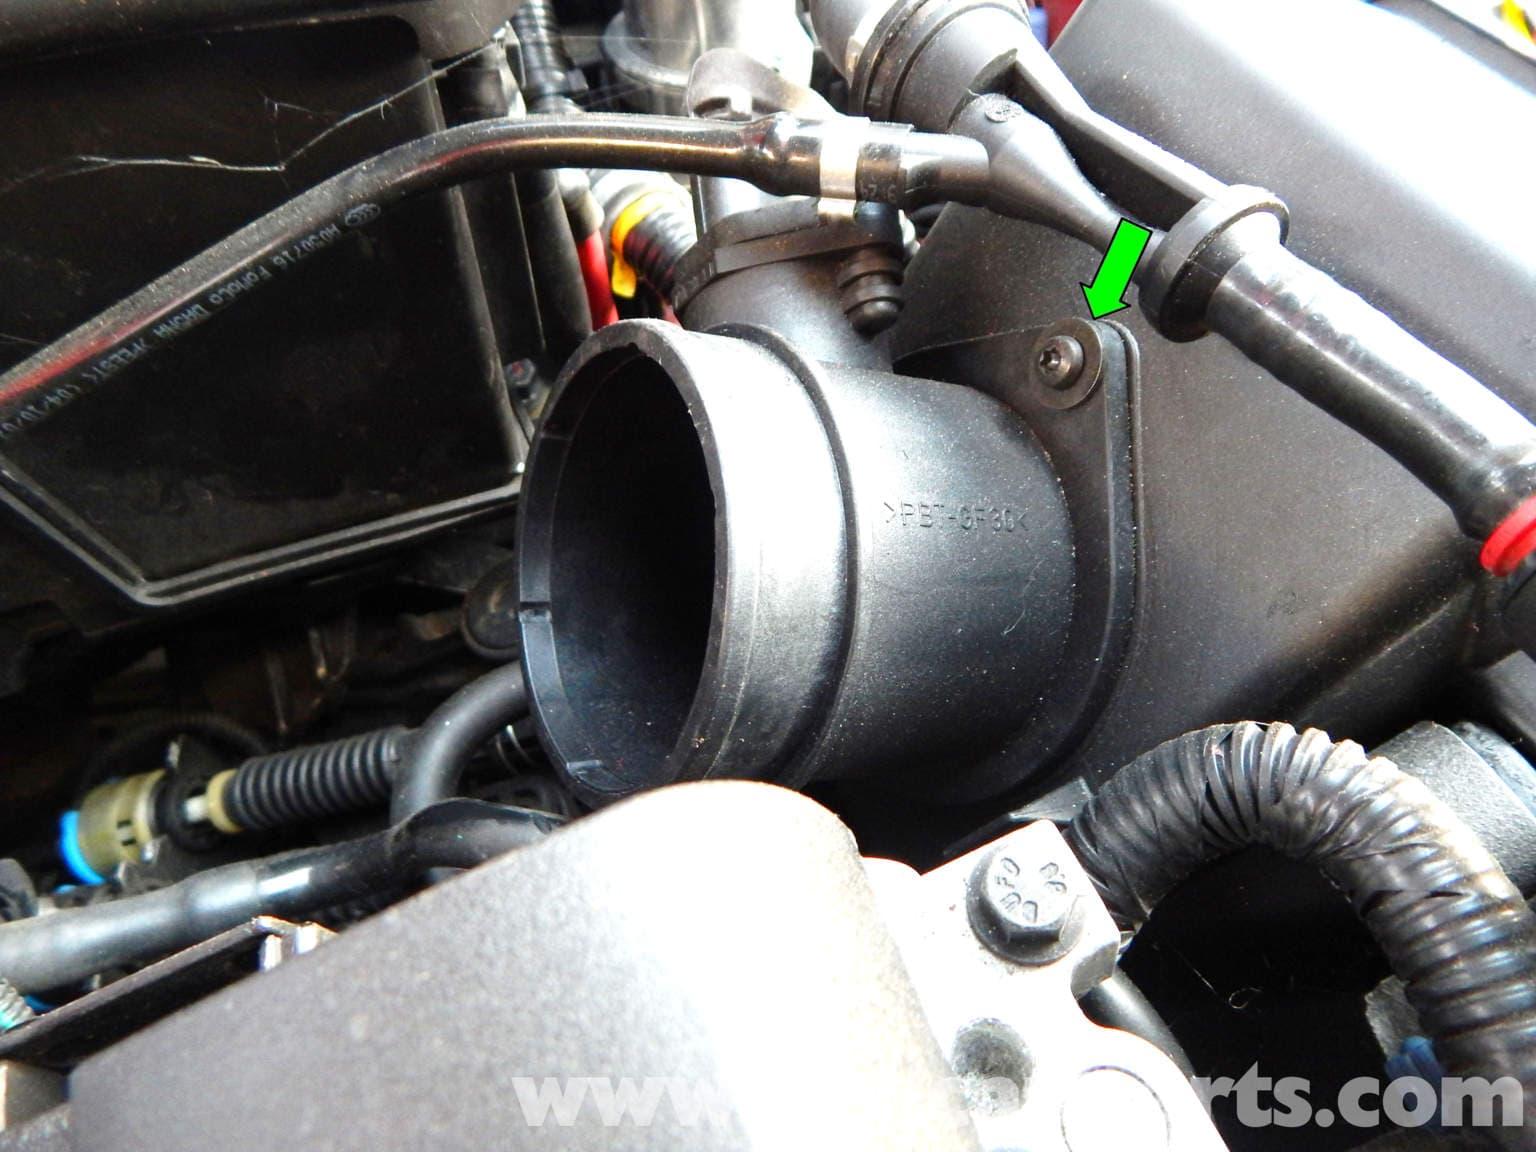 Volvo C30 Mass Air Flow (MAF) Sensor Replacement (2007-2013) - Pelican Parts DIY Maintenance Article